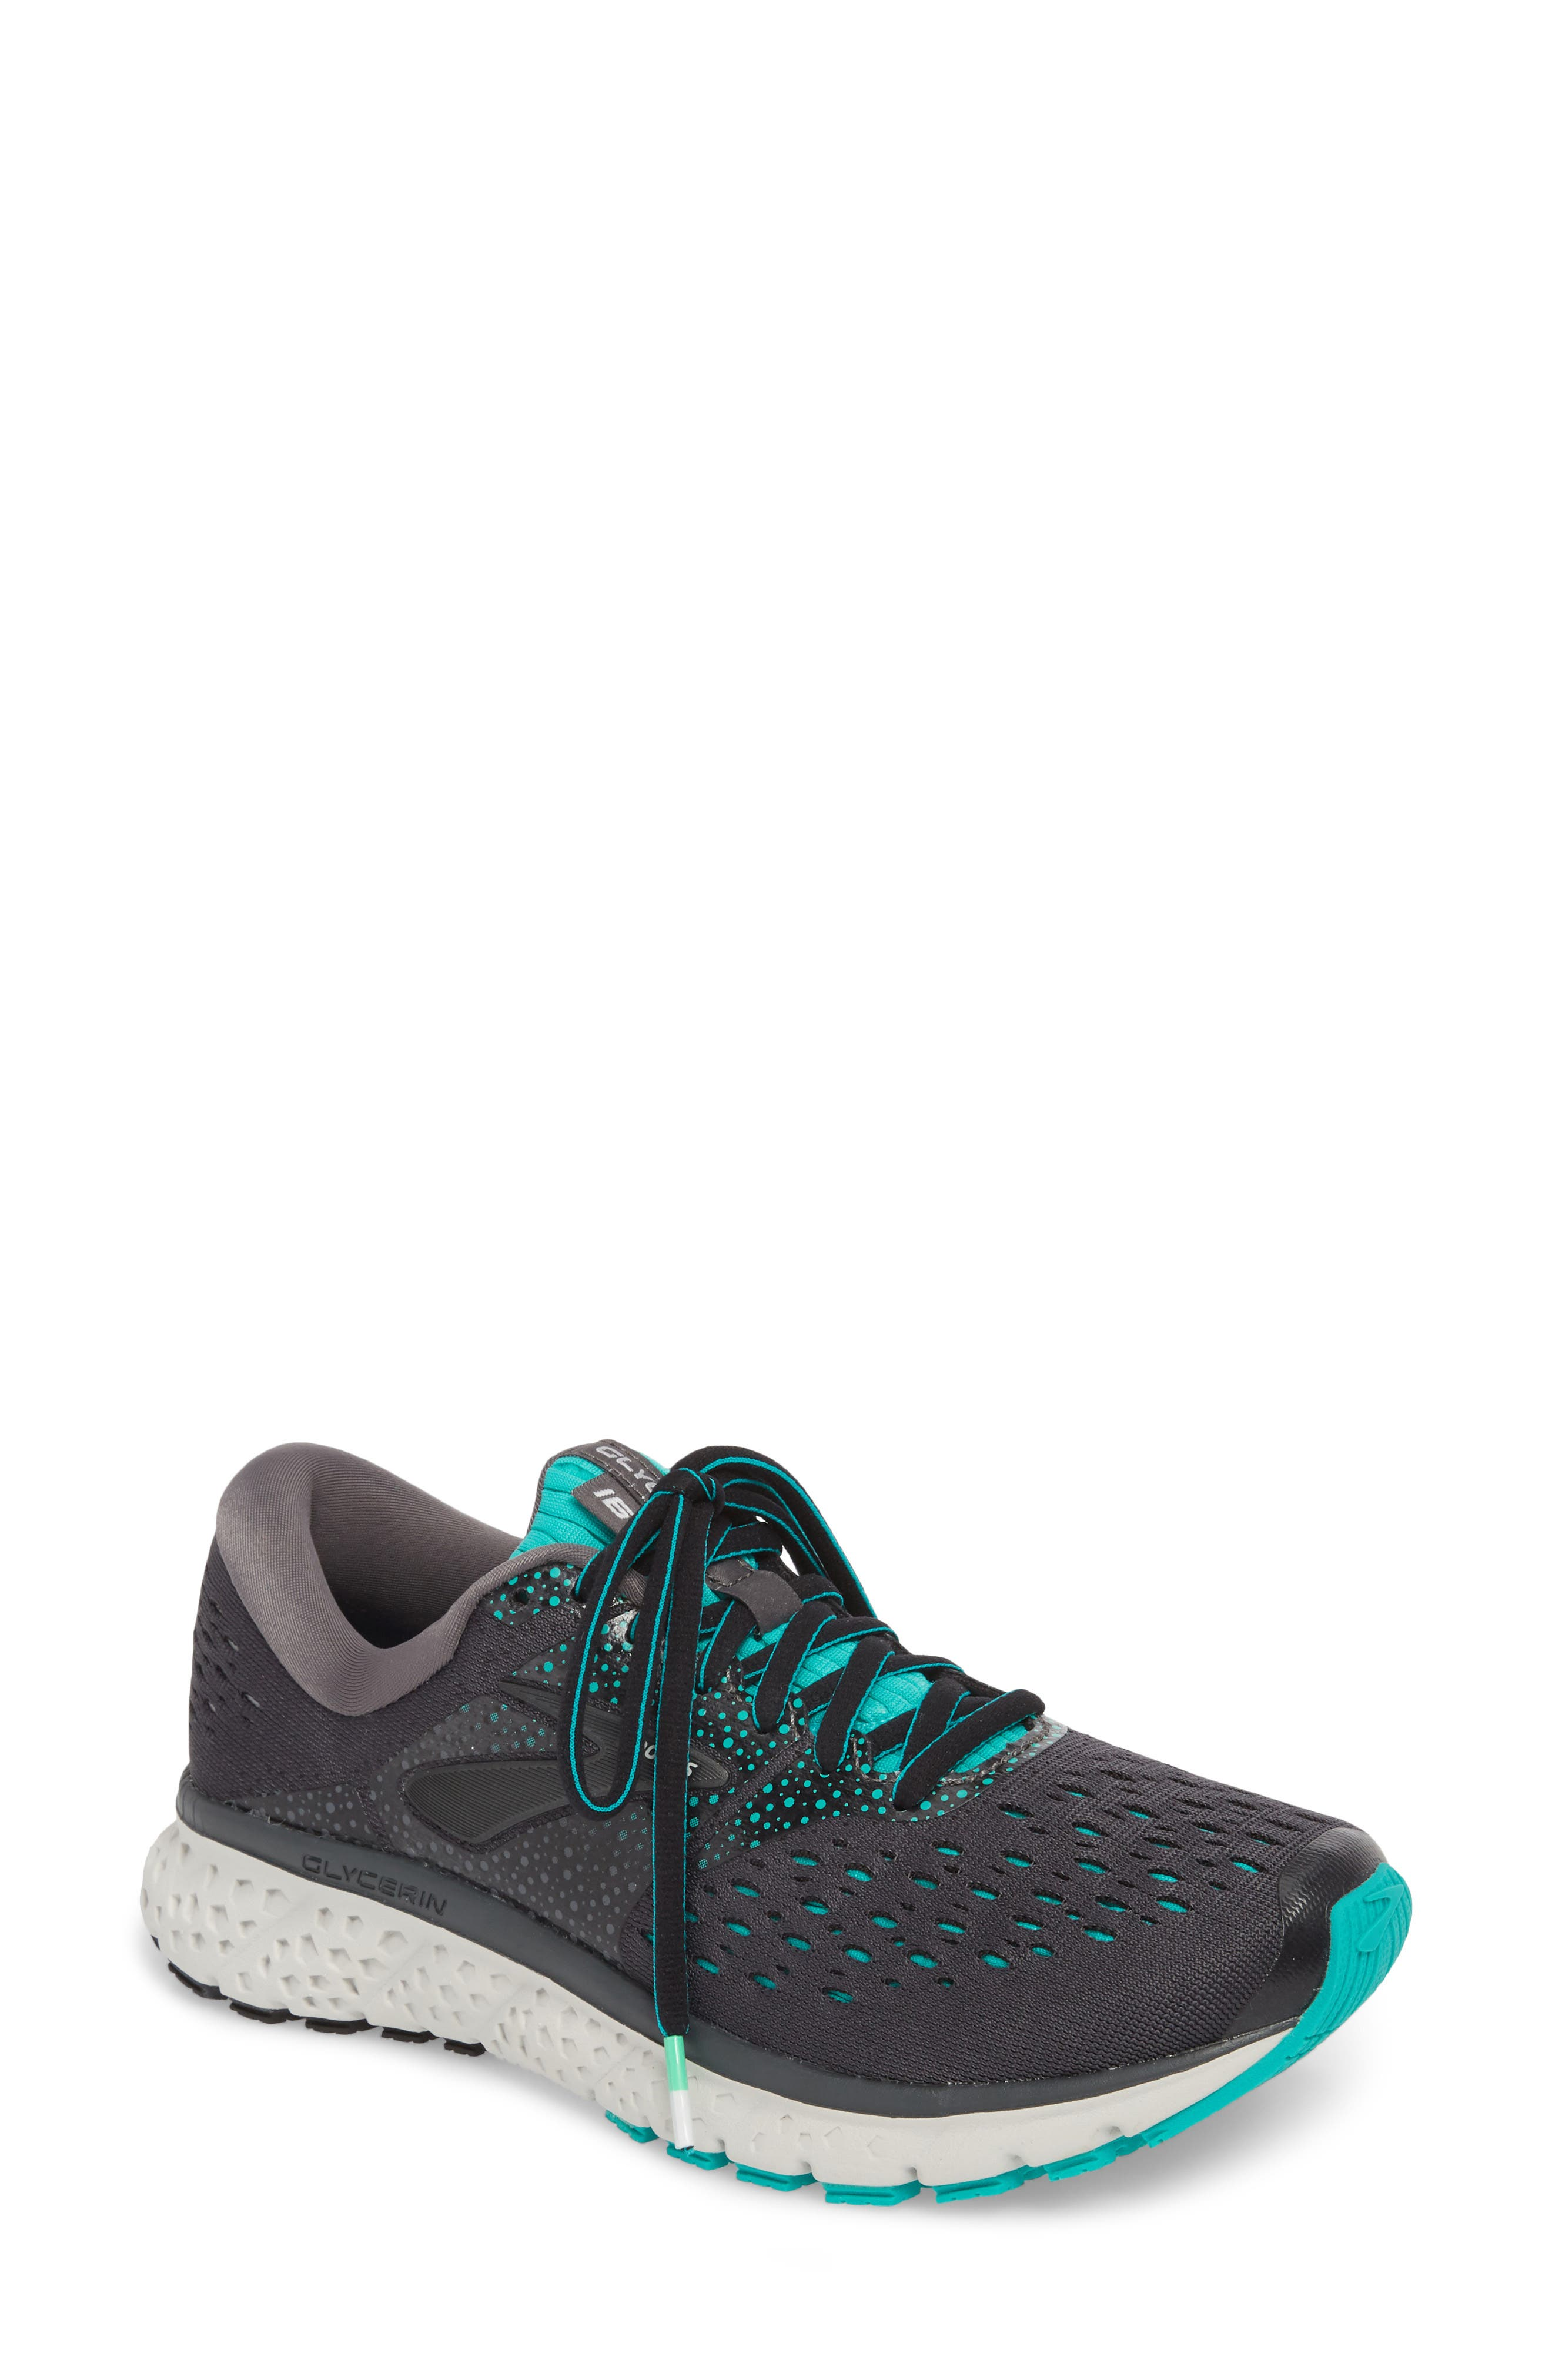 4b497b9bb5013 UPC 012027000086 - Women s Brooks Glycerin 16 Running Shoe ...